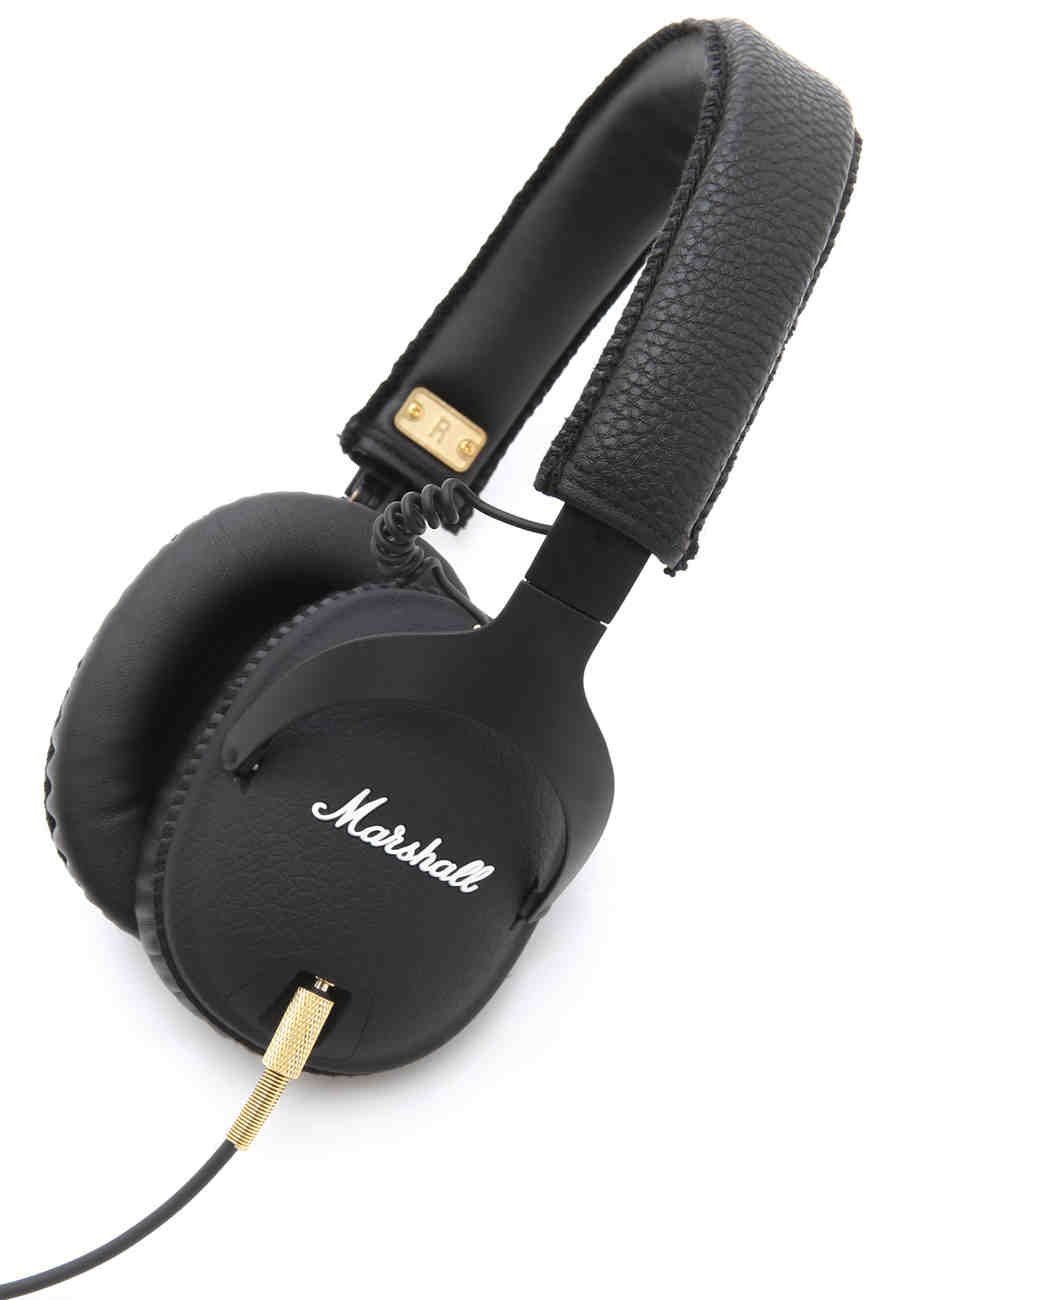 fathers-gift-guide-tech-marshall-headphones-0515.jpg